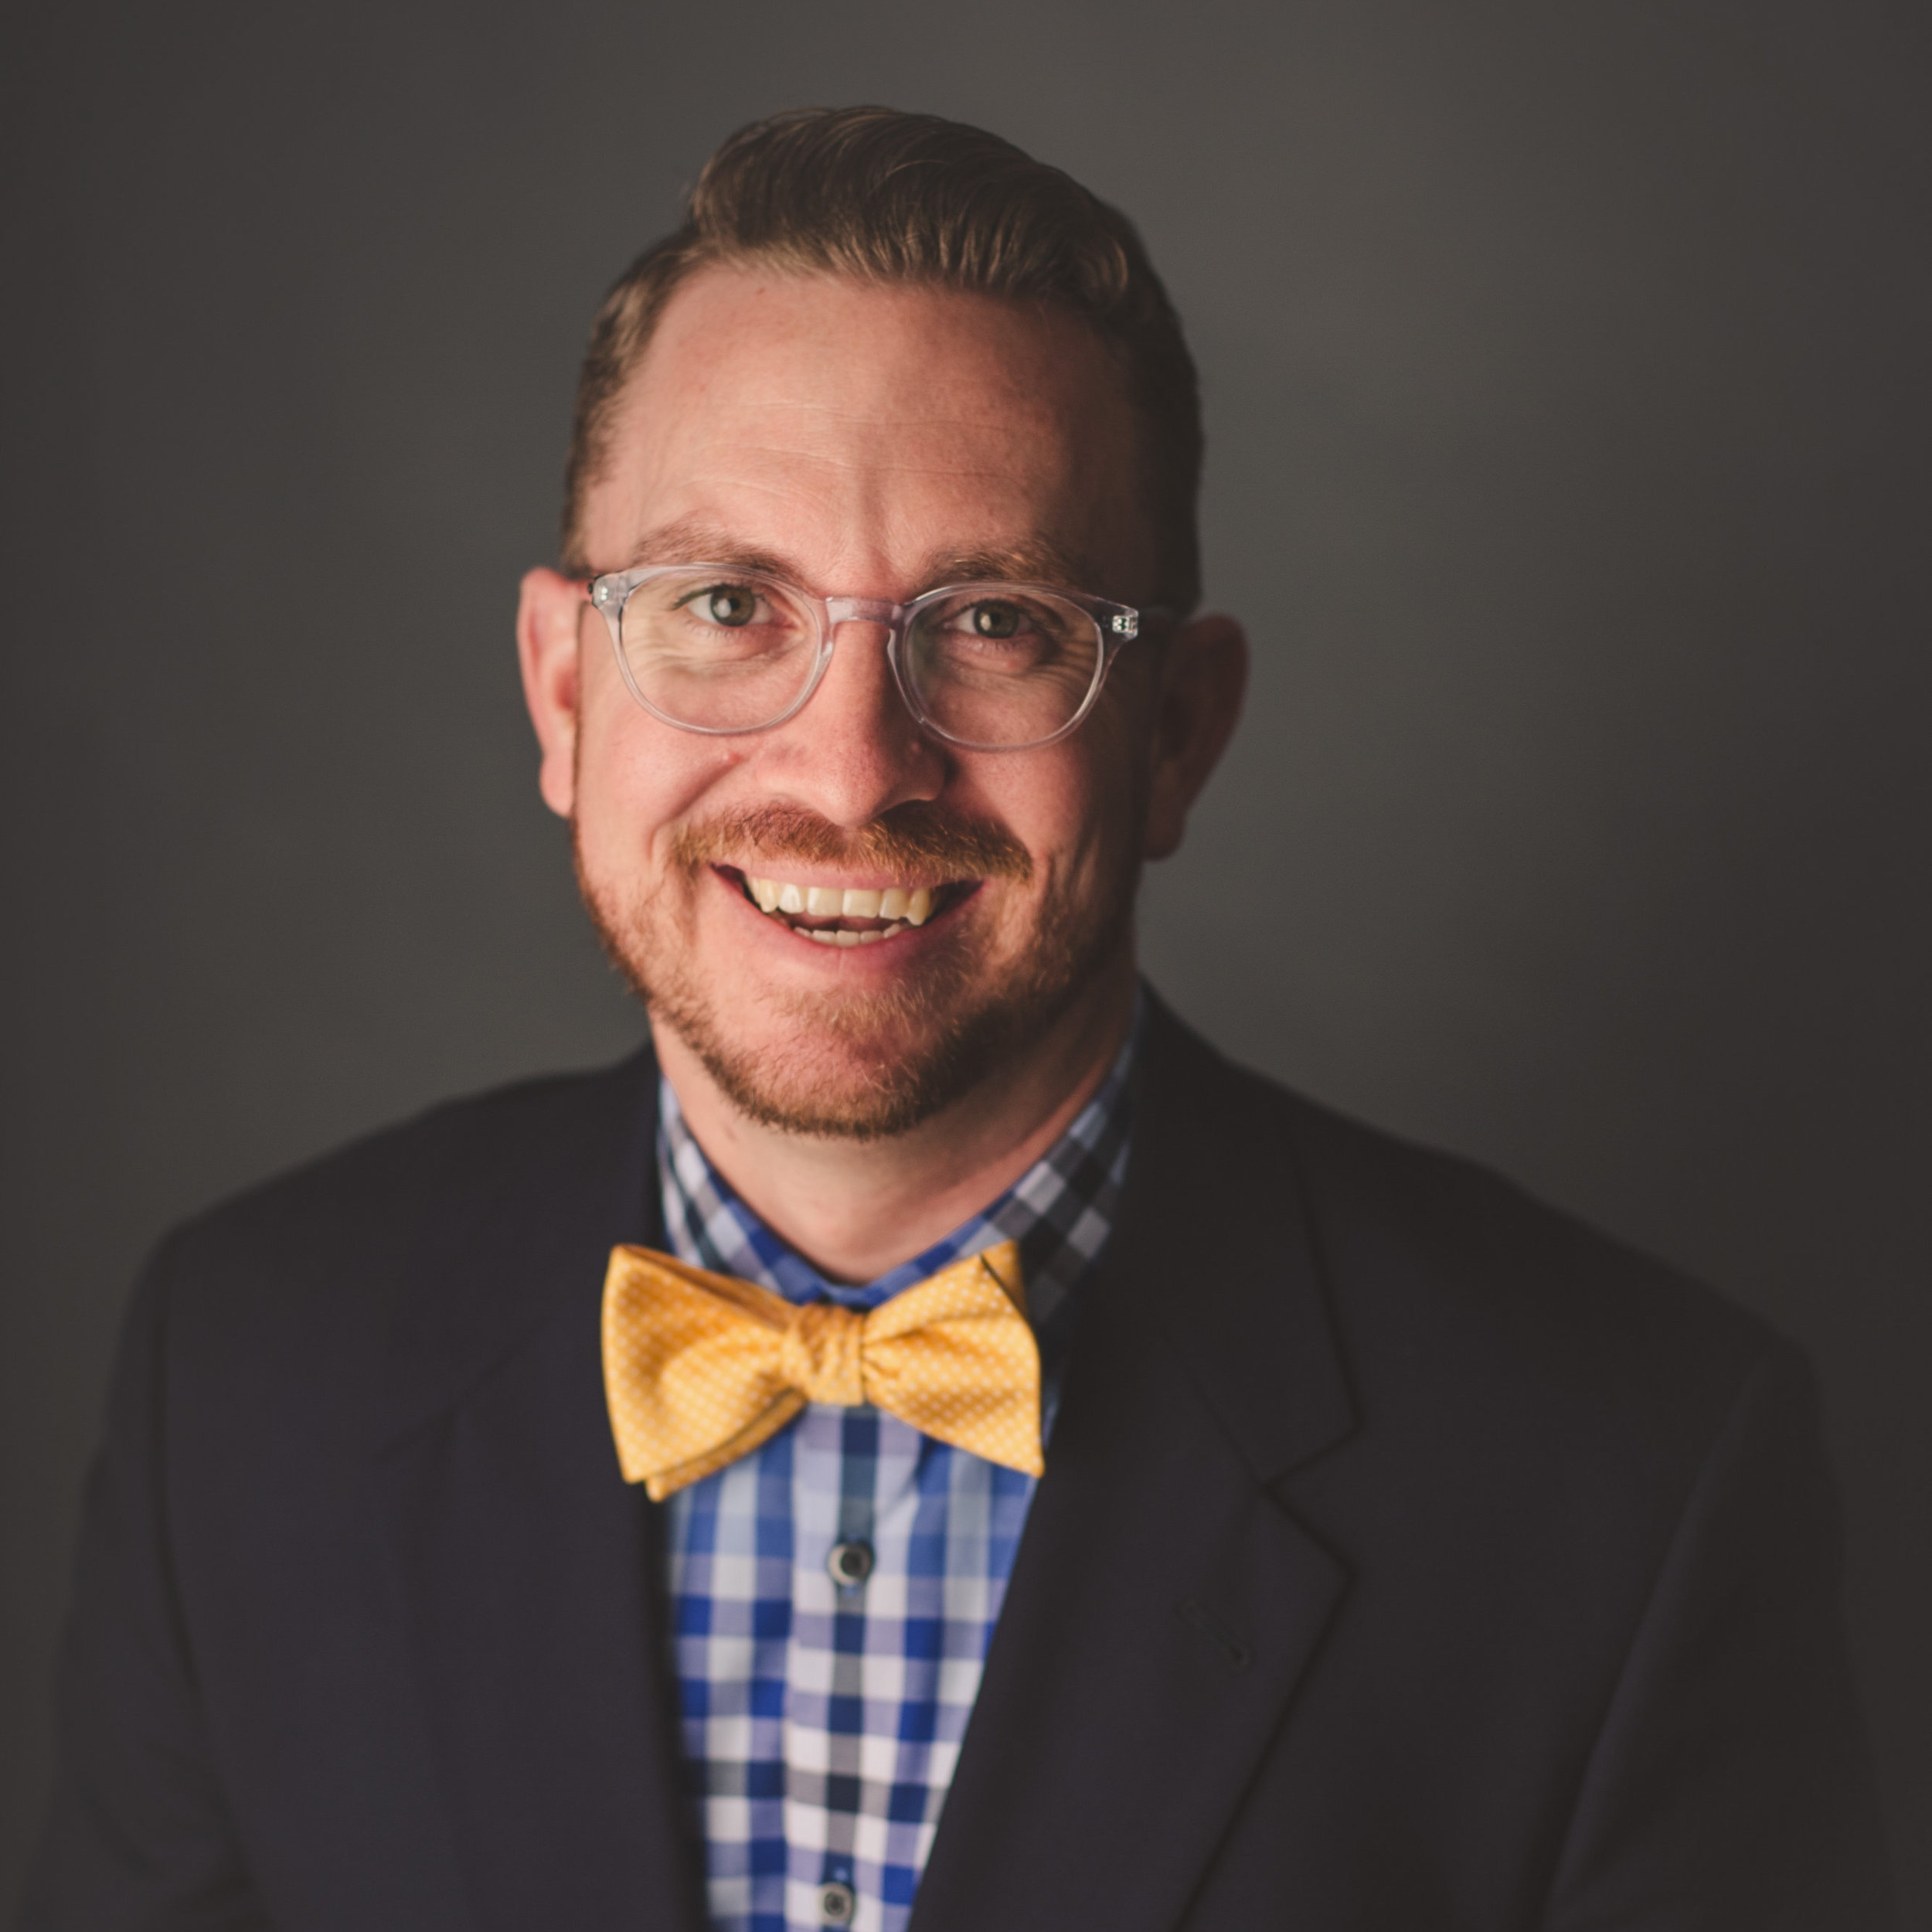 Dan Shurtz - Founder, The Culture Print™